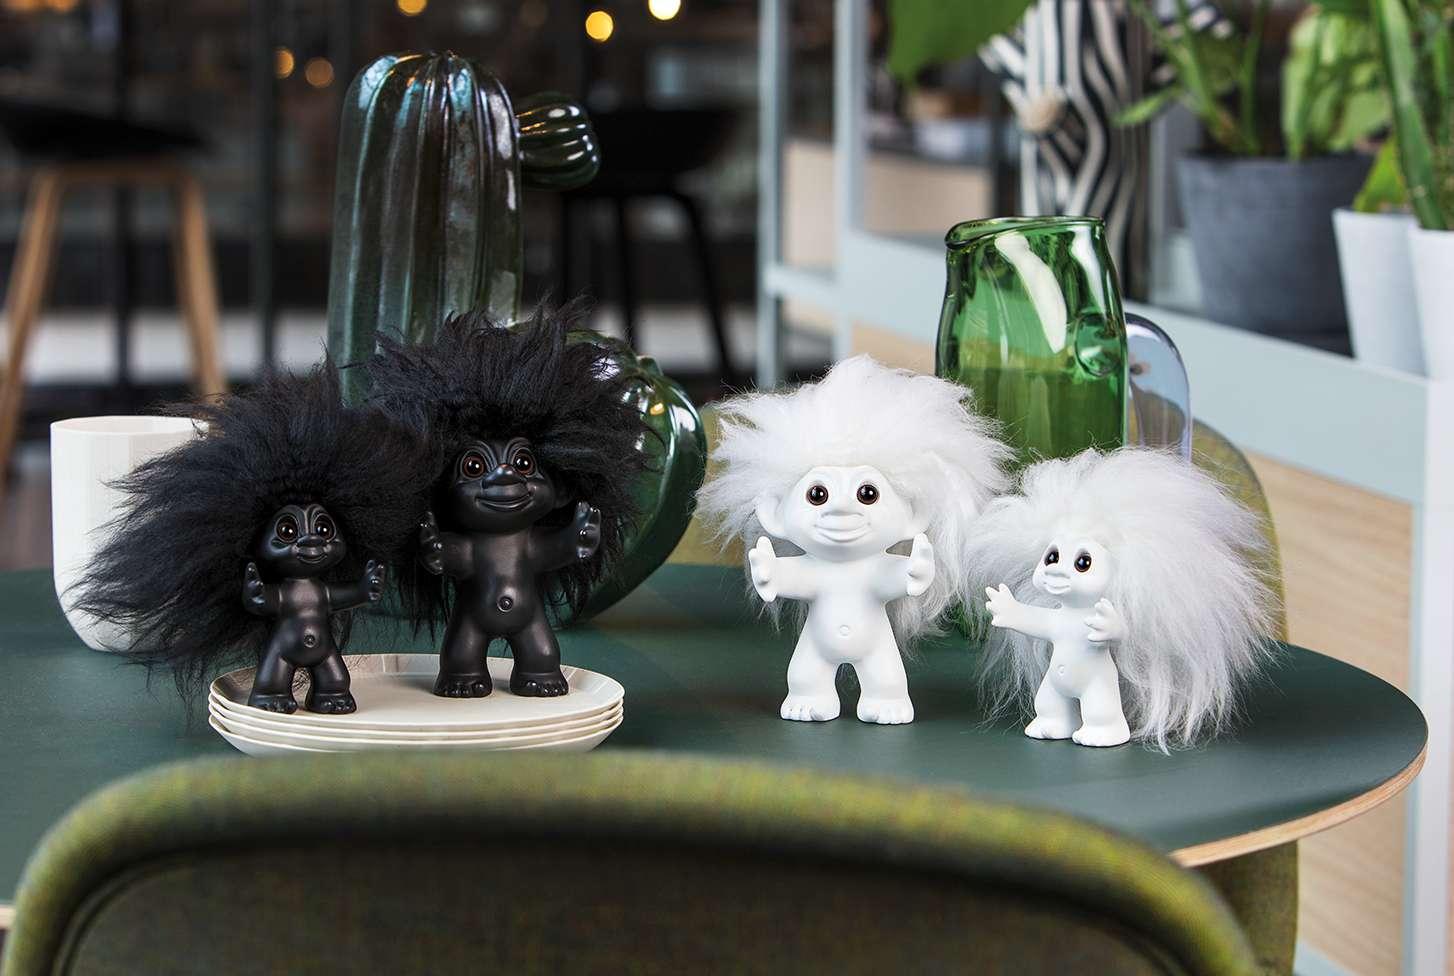 Decorative Trolls for Hotels